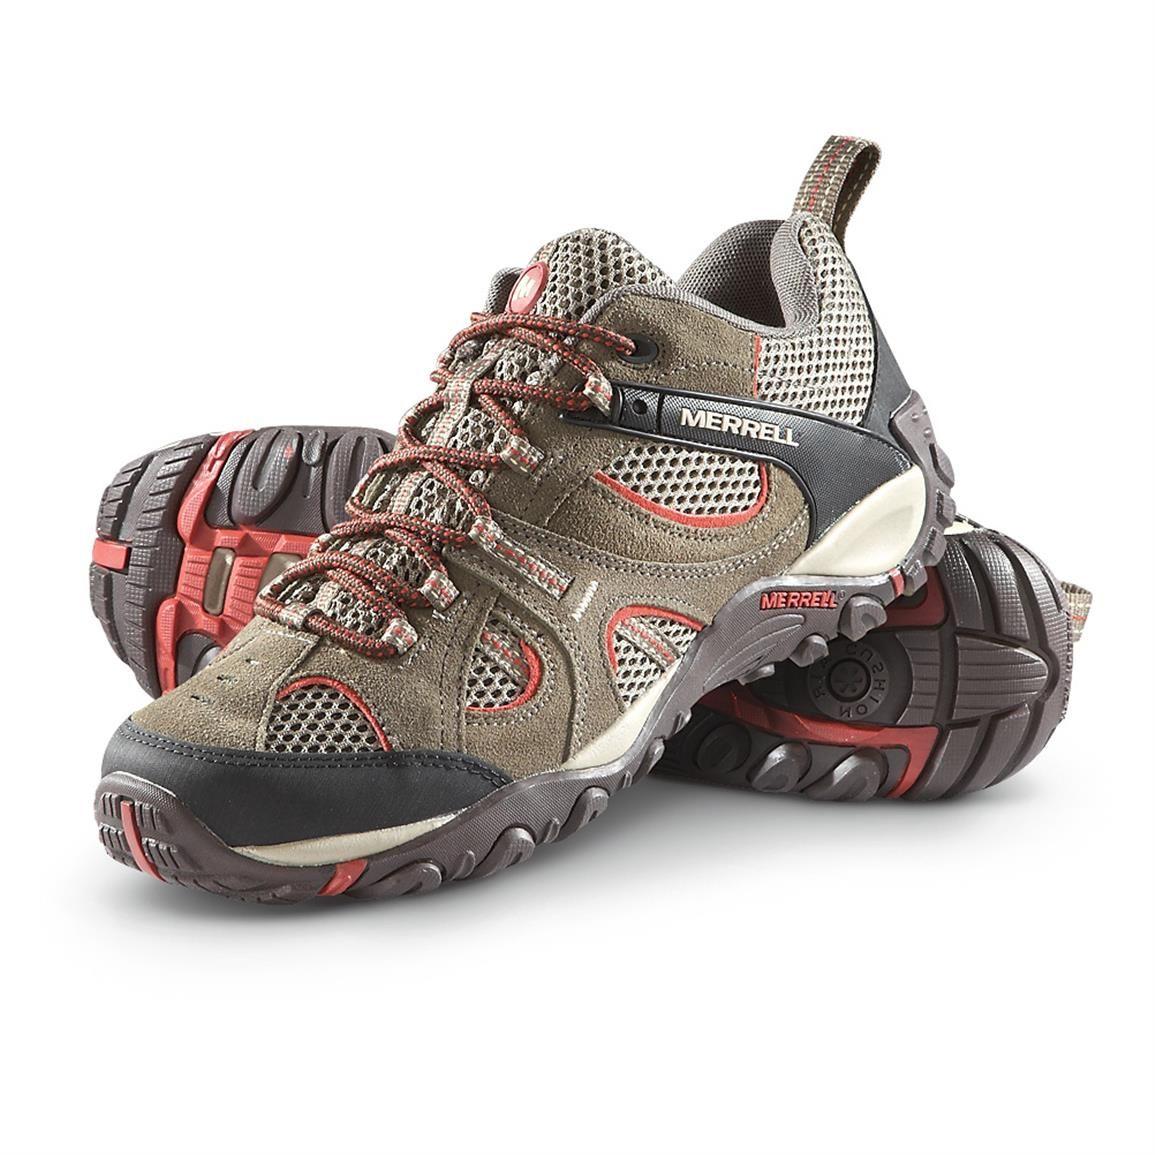 ea93fab627c0 Merrell Men s Yokota Trail Low Hiking Shoes